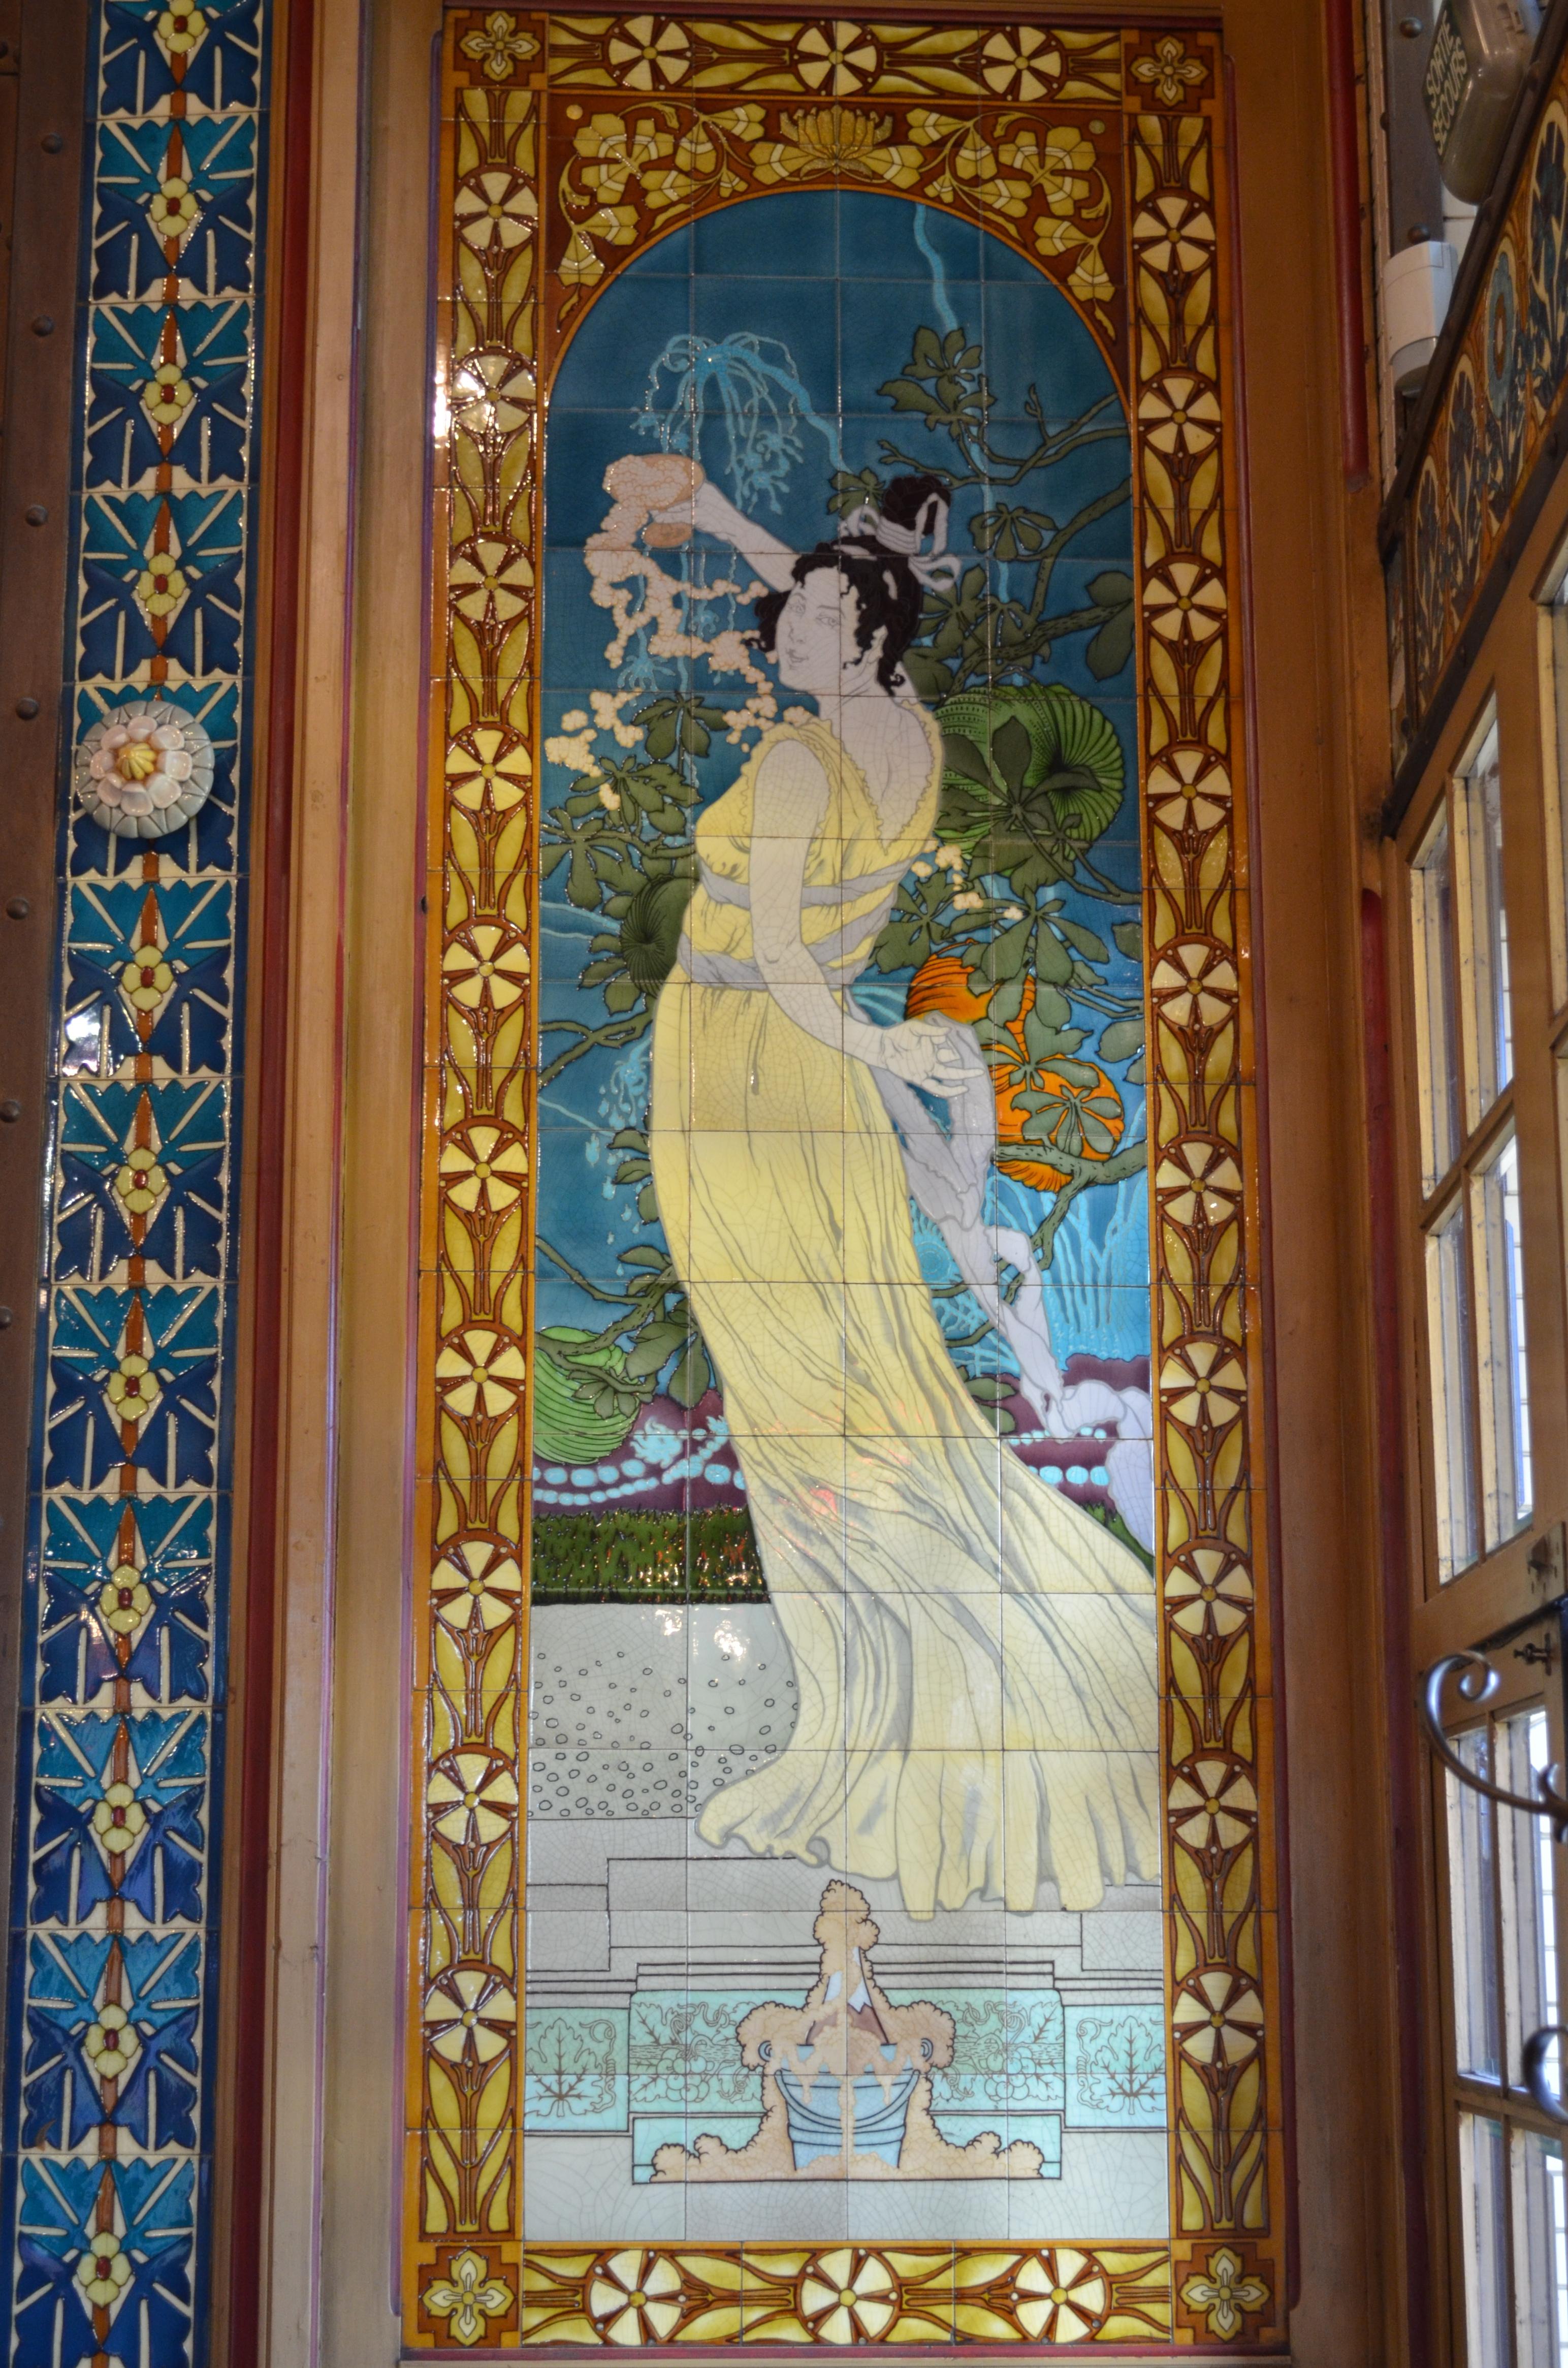 Photos Decoration Int Ef Bf Bdrieure Maison Murs Blancs